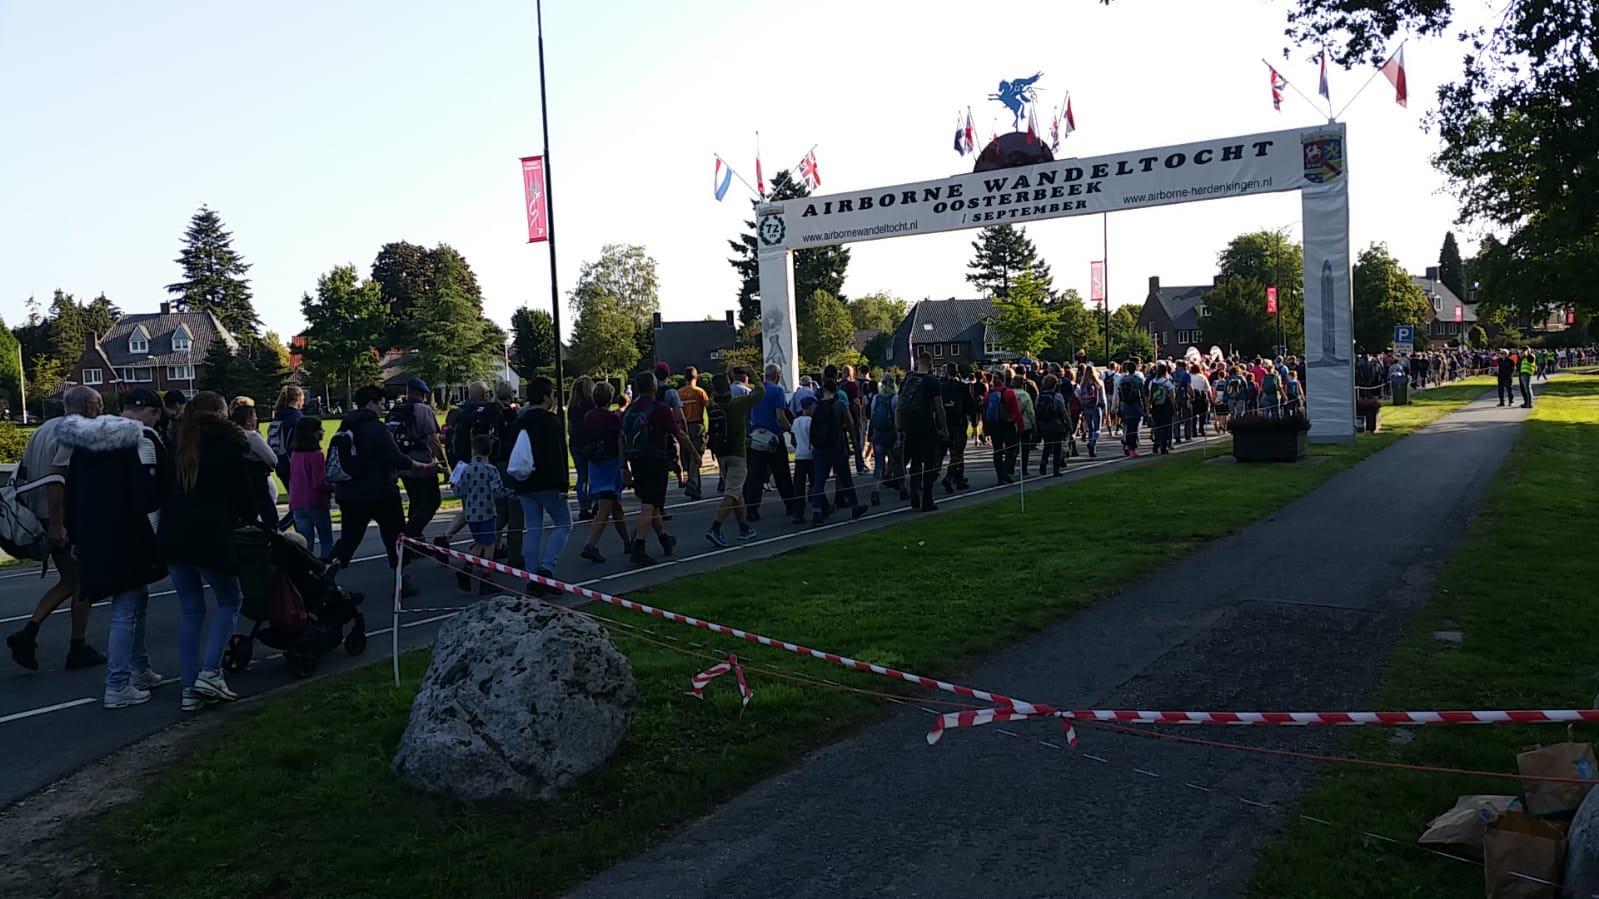 De Airborne Wandeltocht in Oosterbeek.